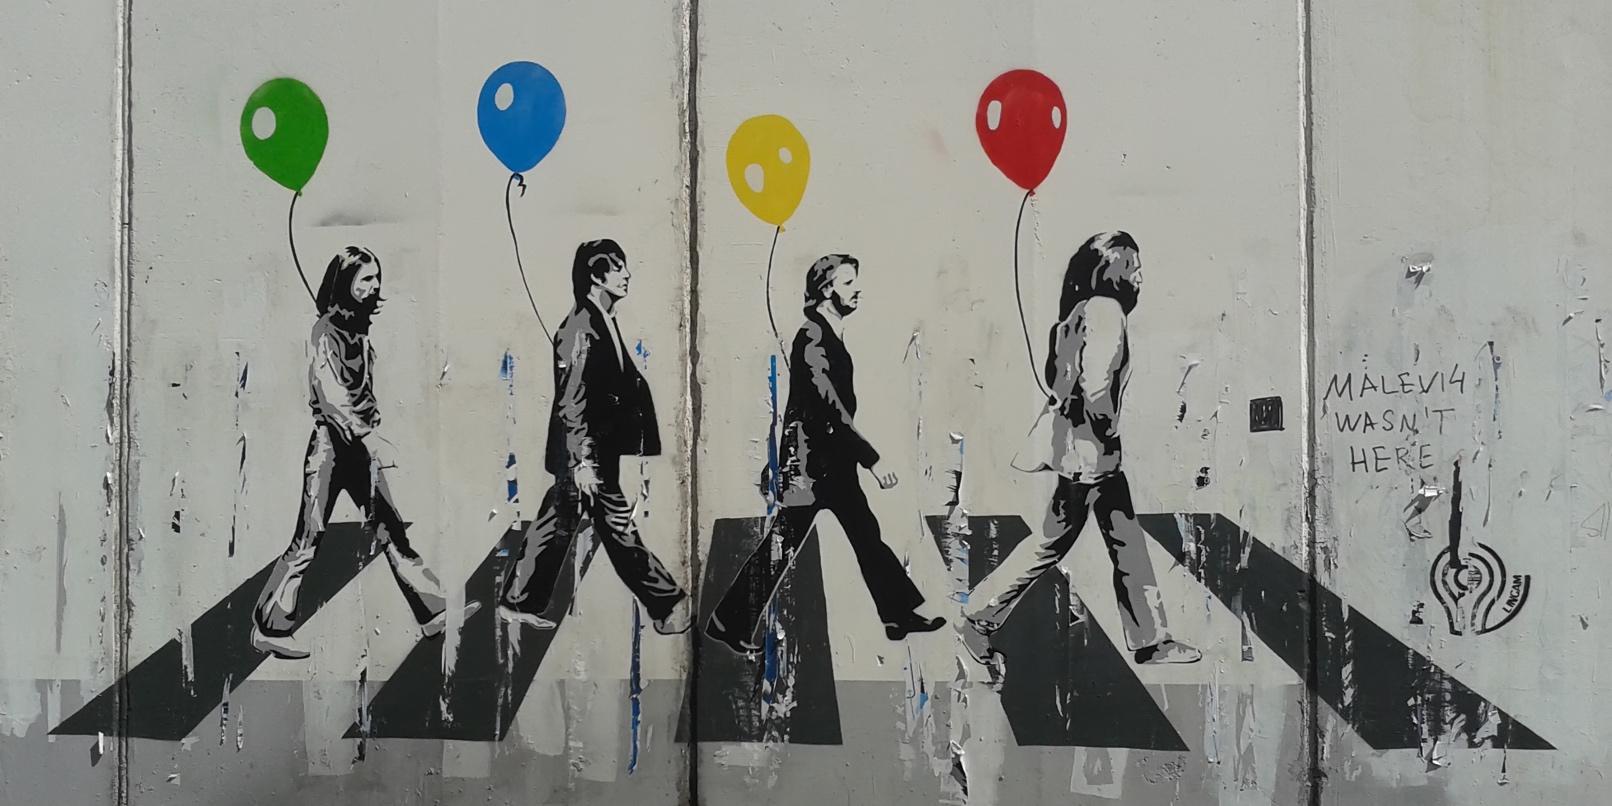 RT @TheNextWeb: Why the Beatles are letting down a generation http://t.co/KnGjSJQNeE http://t.co/U0QEB2Pnu1